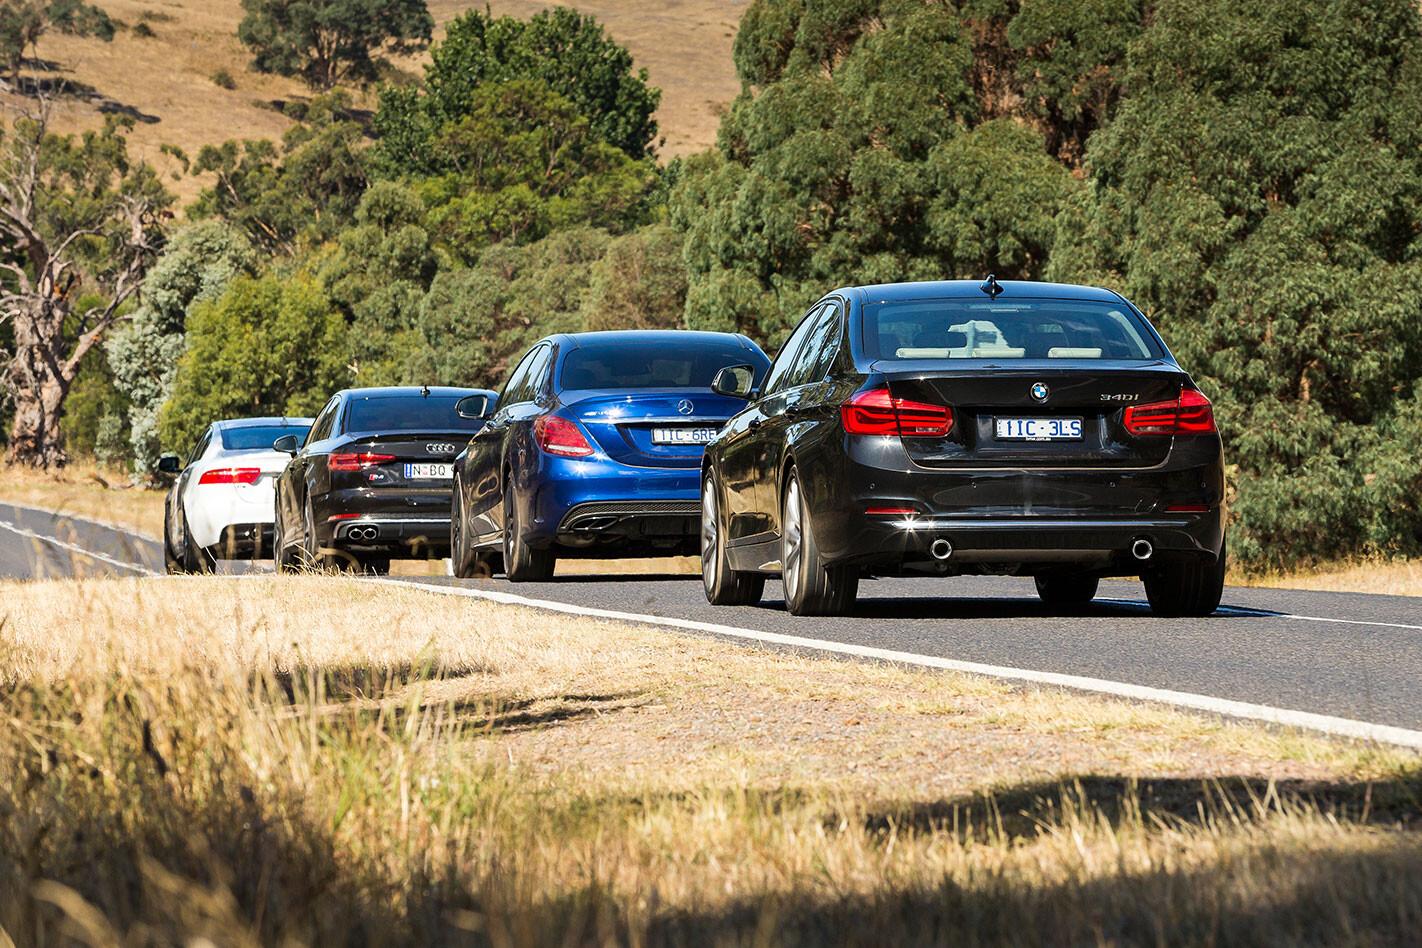 Jaguar XE S vs BMW 340i vs Mercedes-AMG C43 vs Audi S4  rear